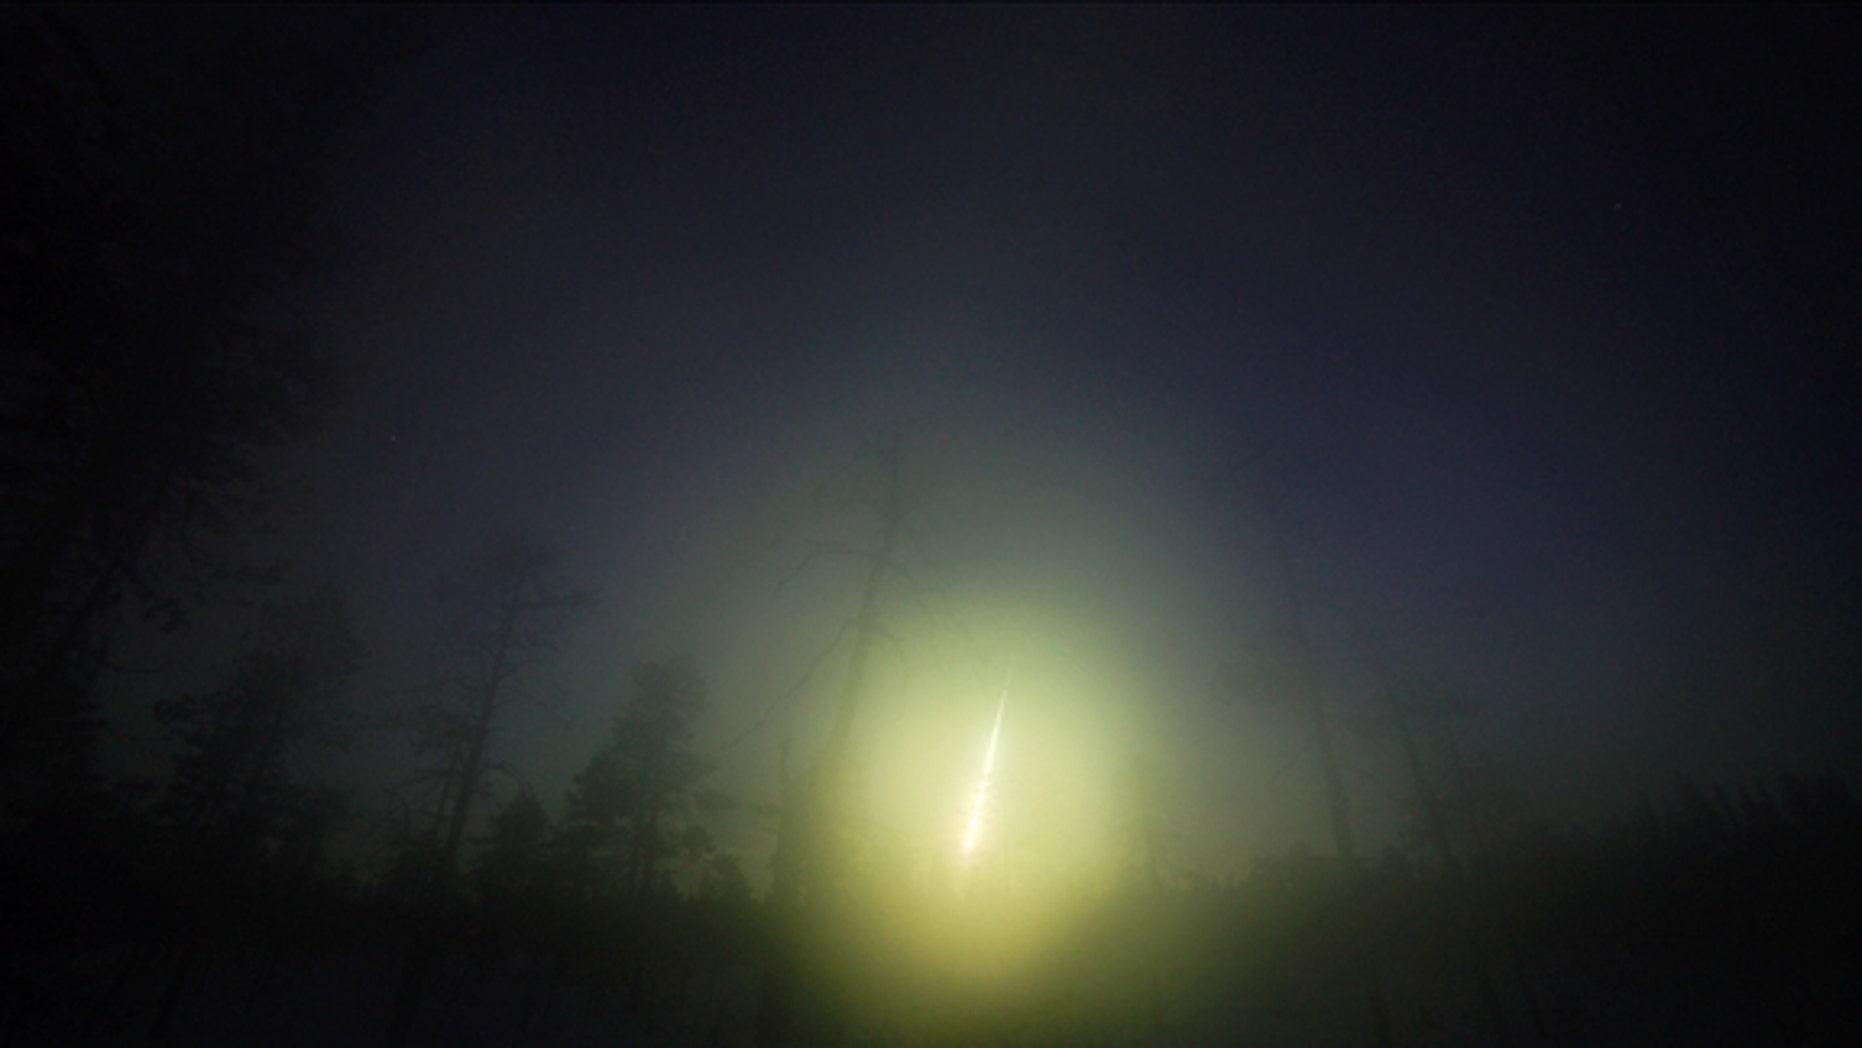 A picture of the Annama meteorite fireball over Russia's Kola Peninsula.